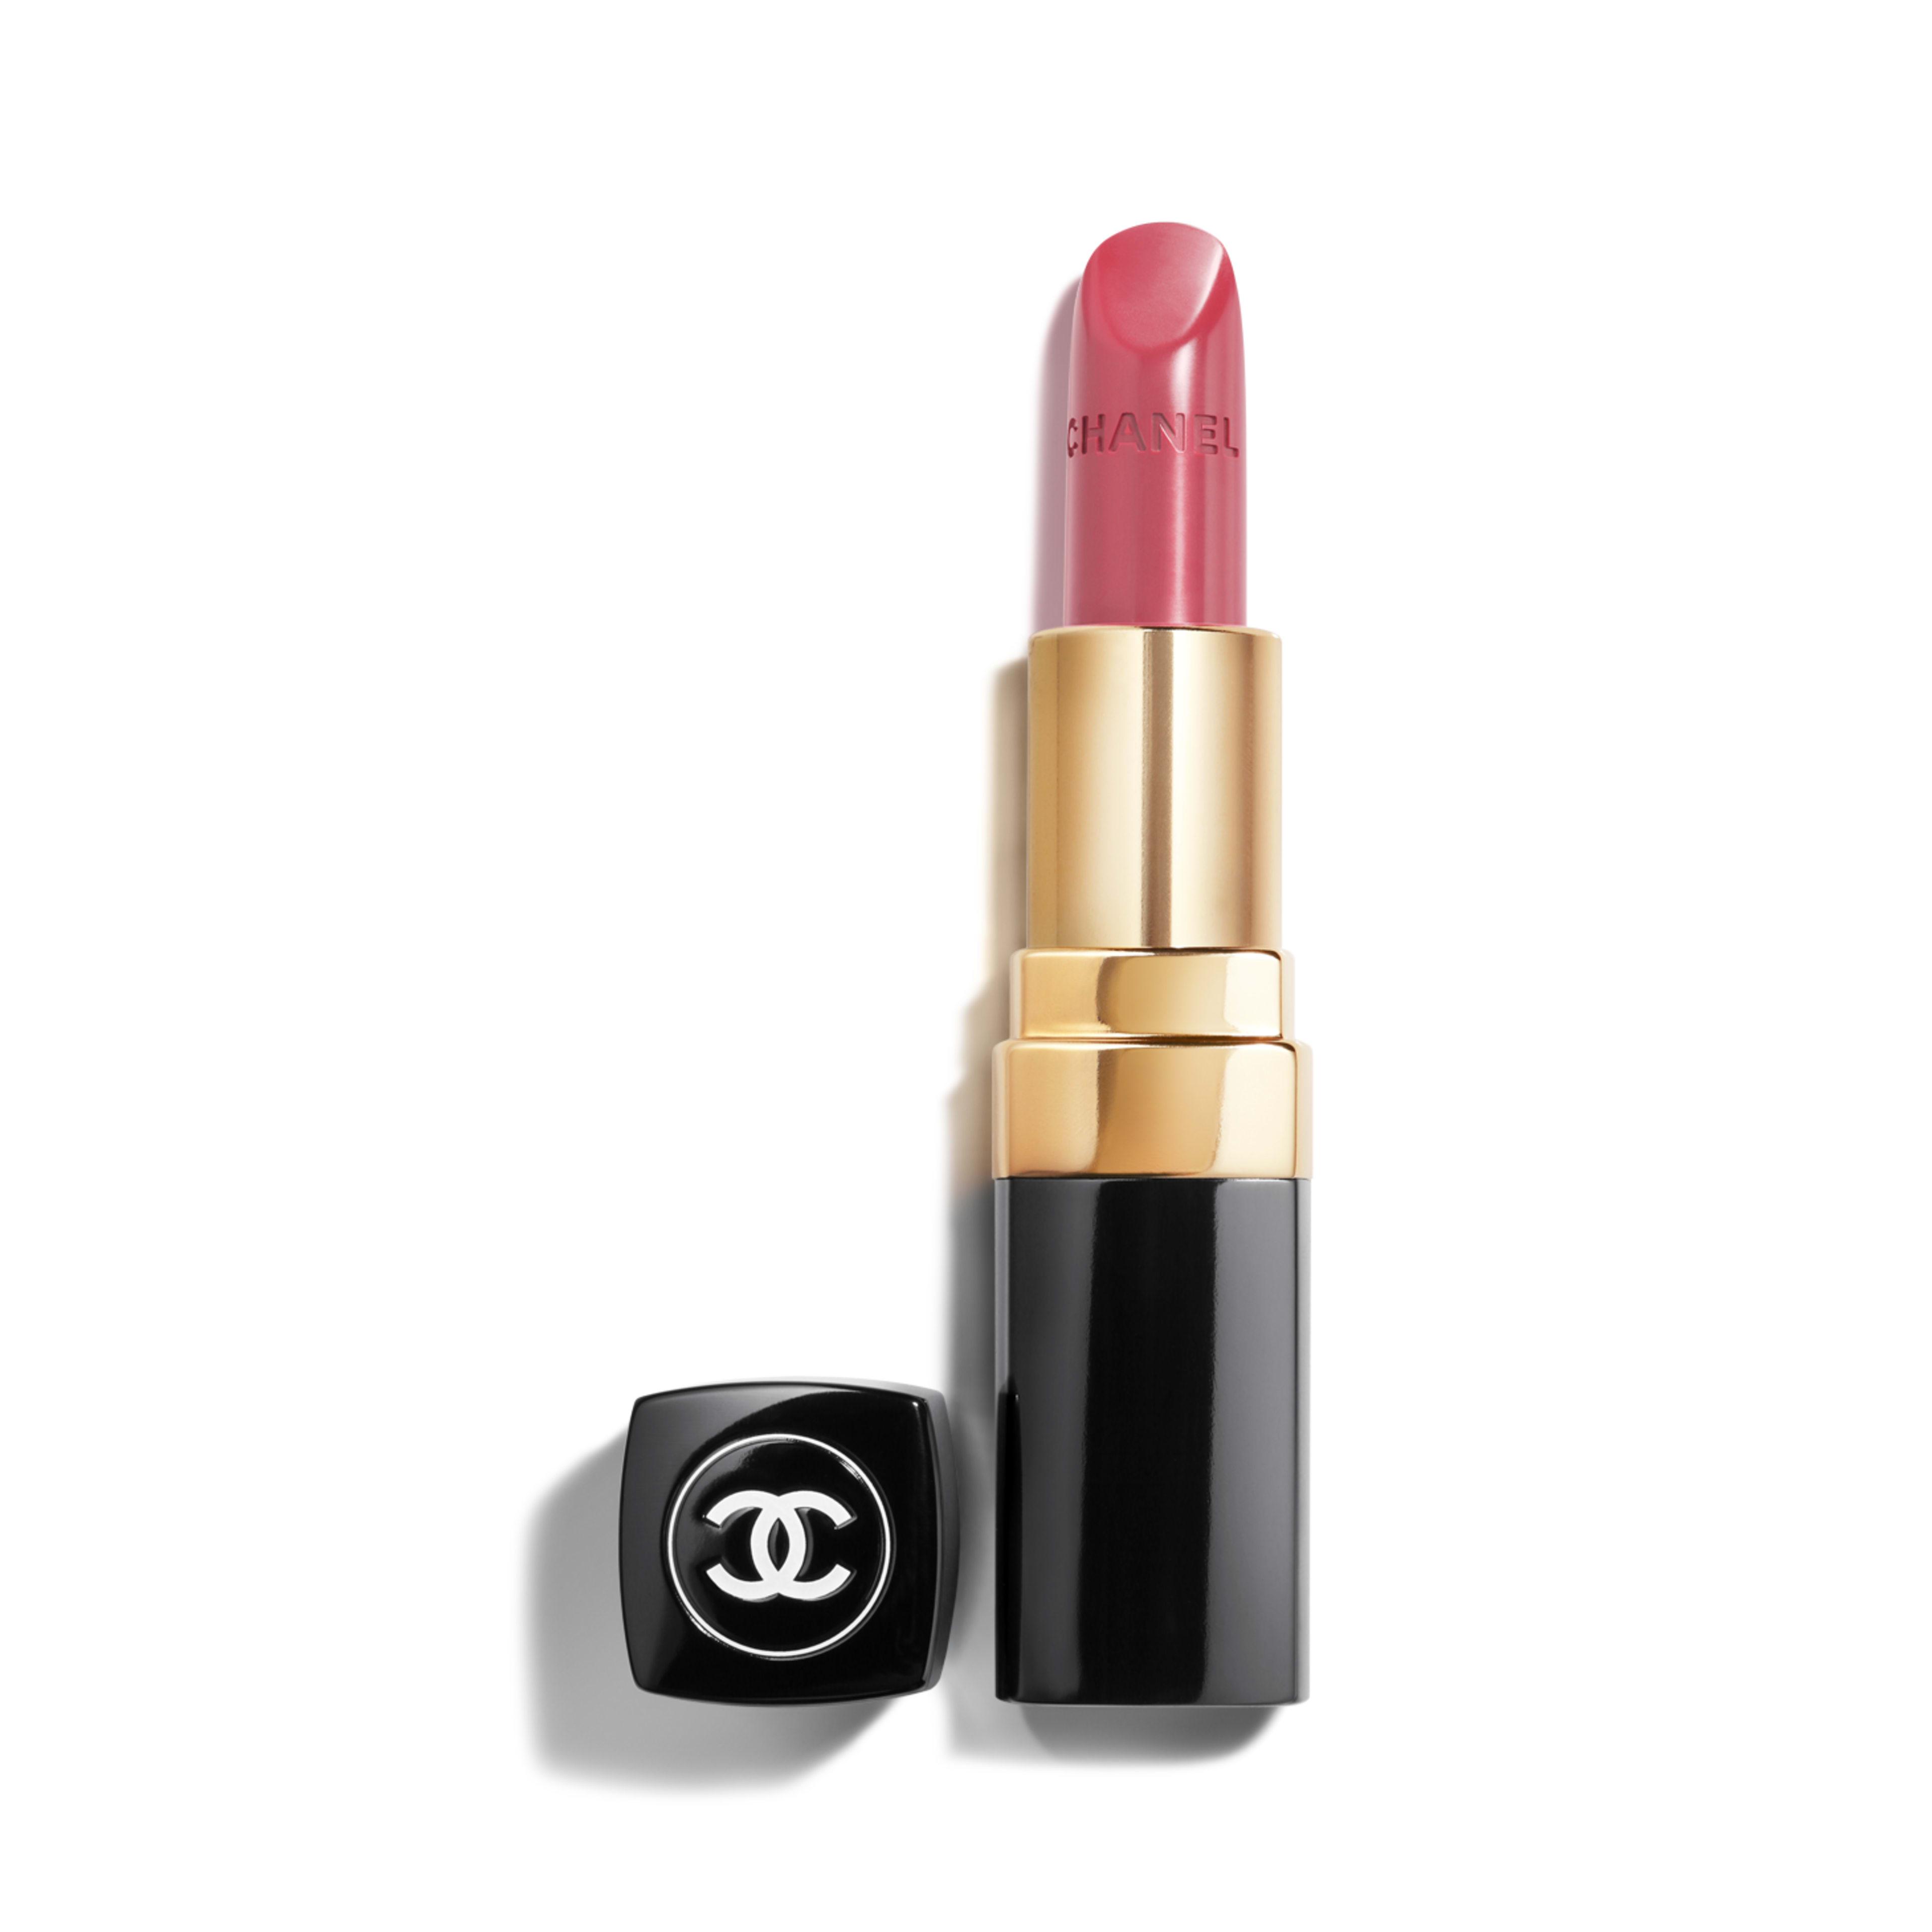 ROUGE COCO - makeup - 3.5g - Widok domyślny